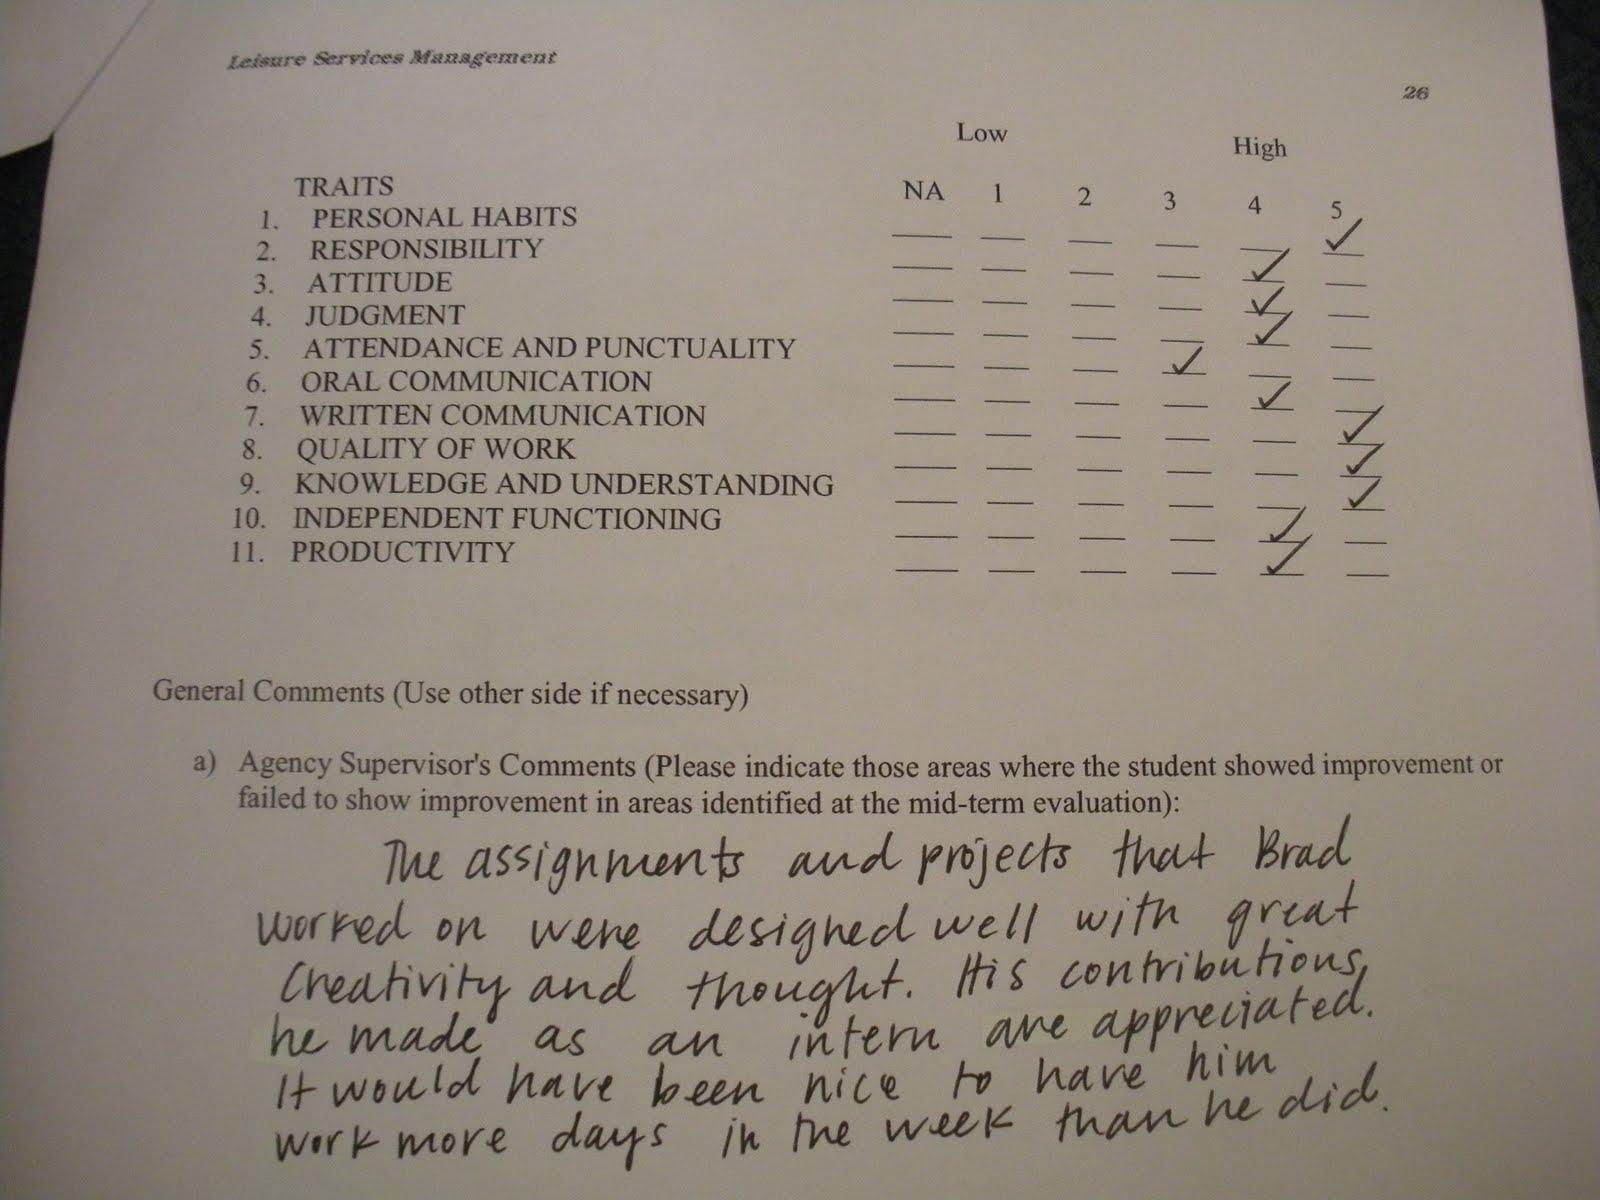 brad ellertson u0026 39 s byu internship portfolio  final